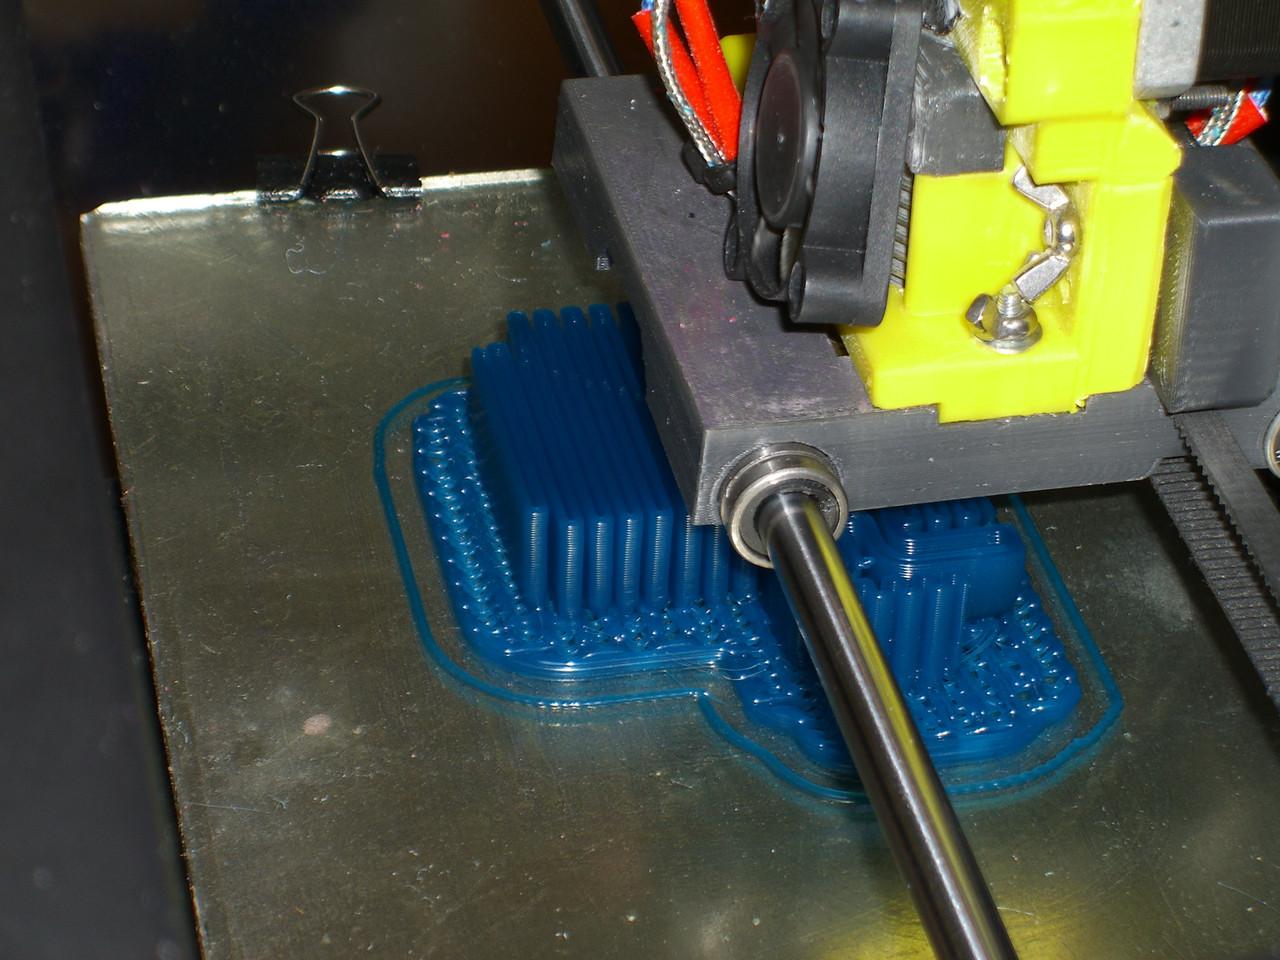 Wax Filament 3D Printing